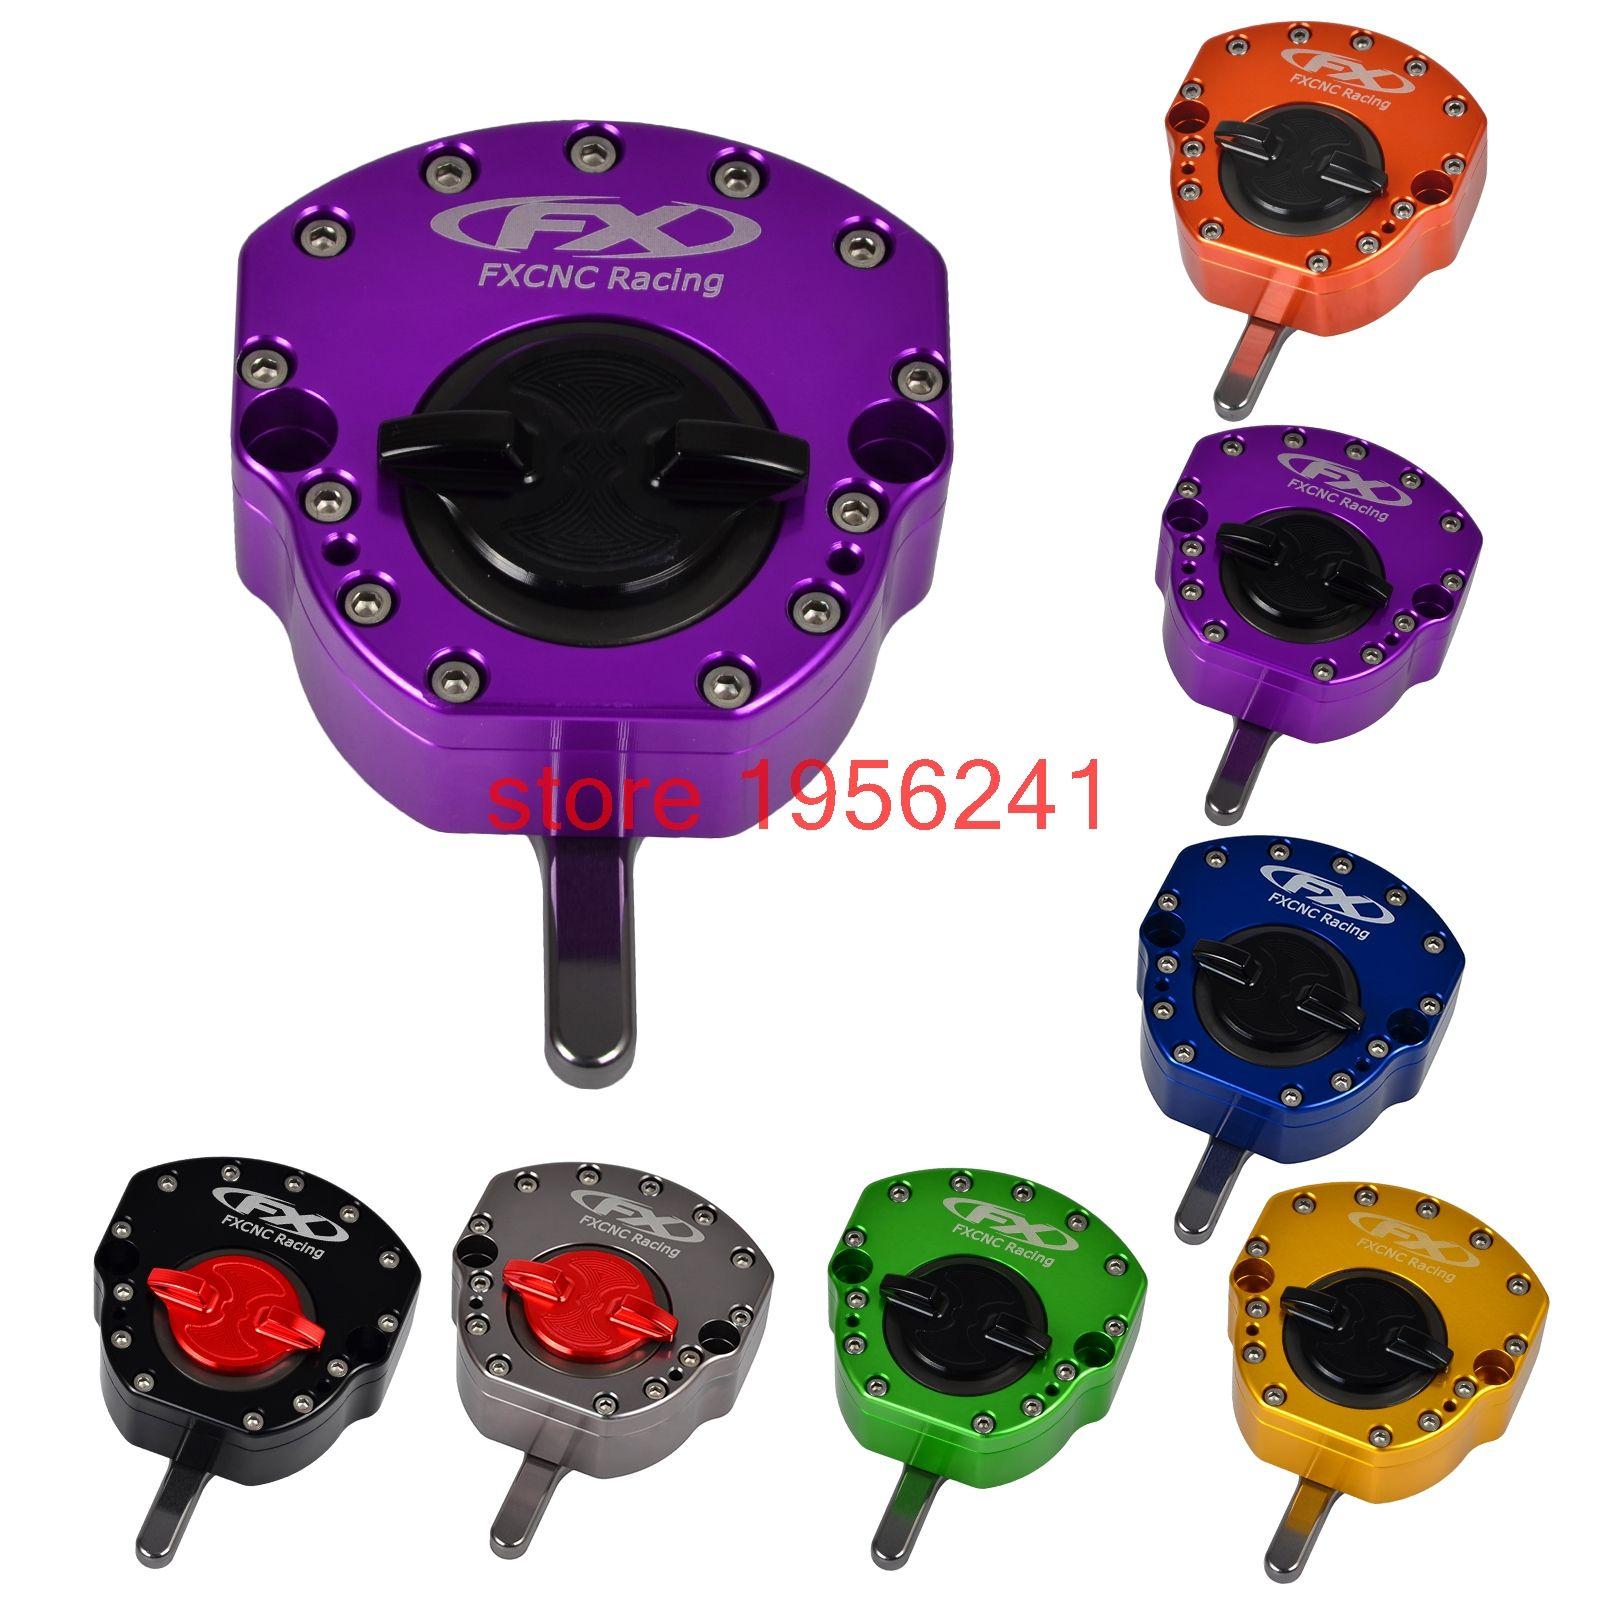 CNC Steering Stabilizer Damper For Honda CBR600RR 2003-2012 CBR900RR 1998 1999 CBR1000RR 2004-2012 NEW